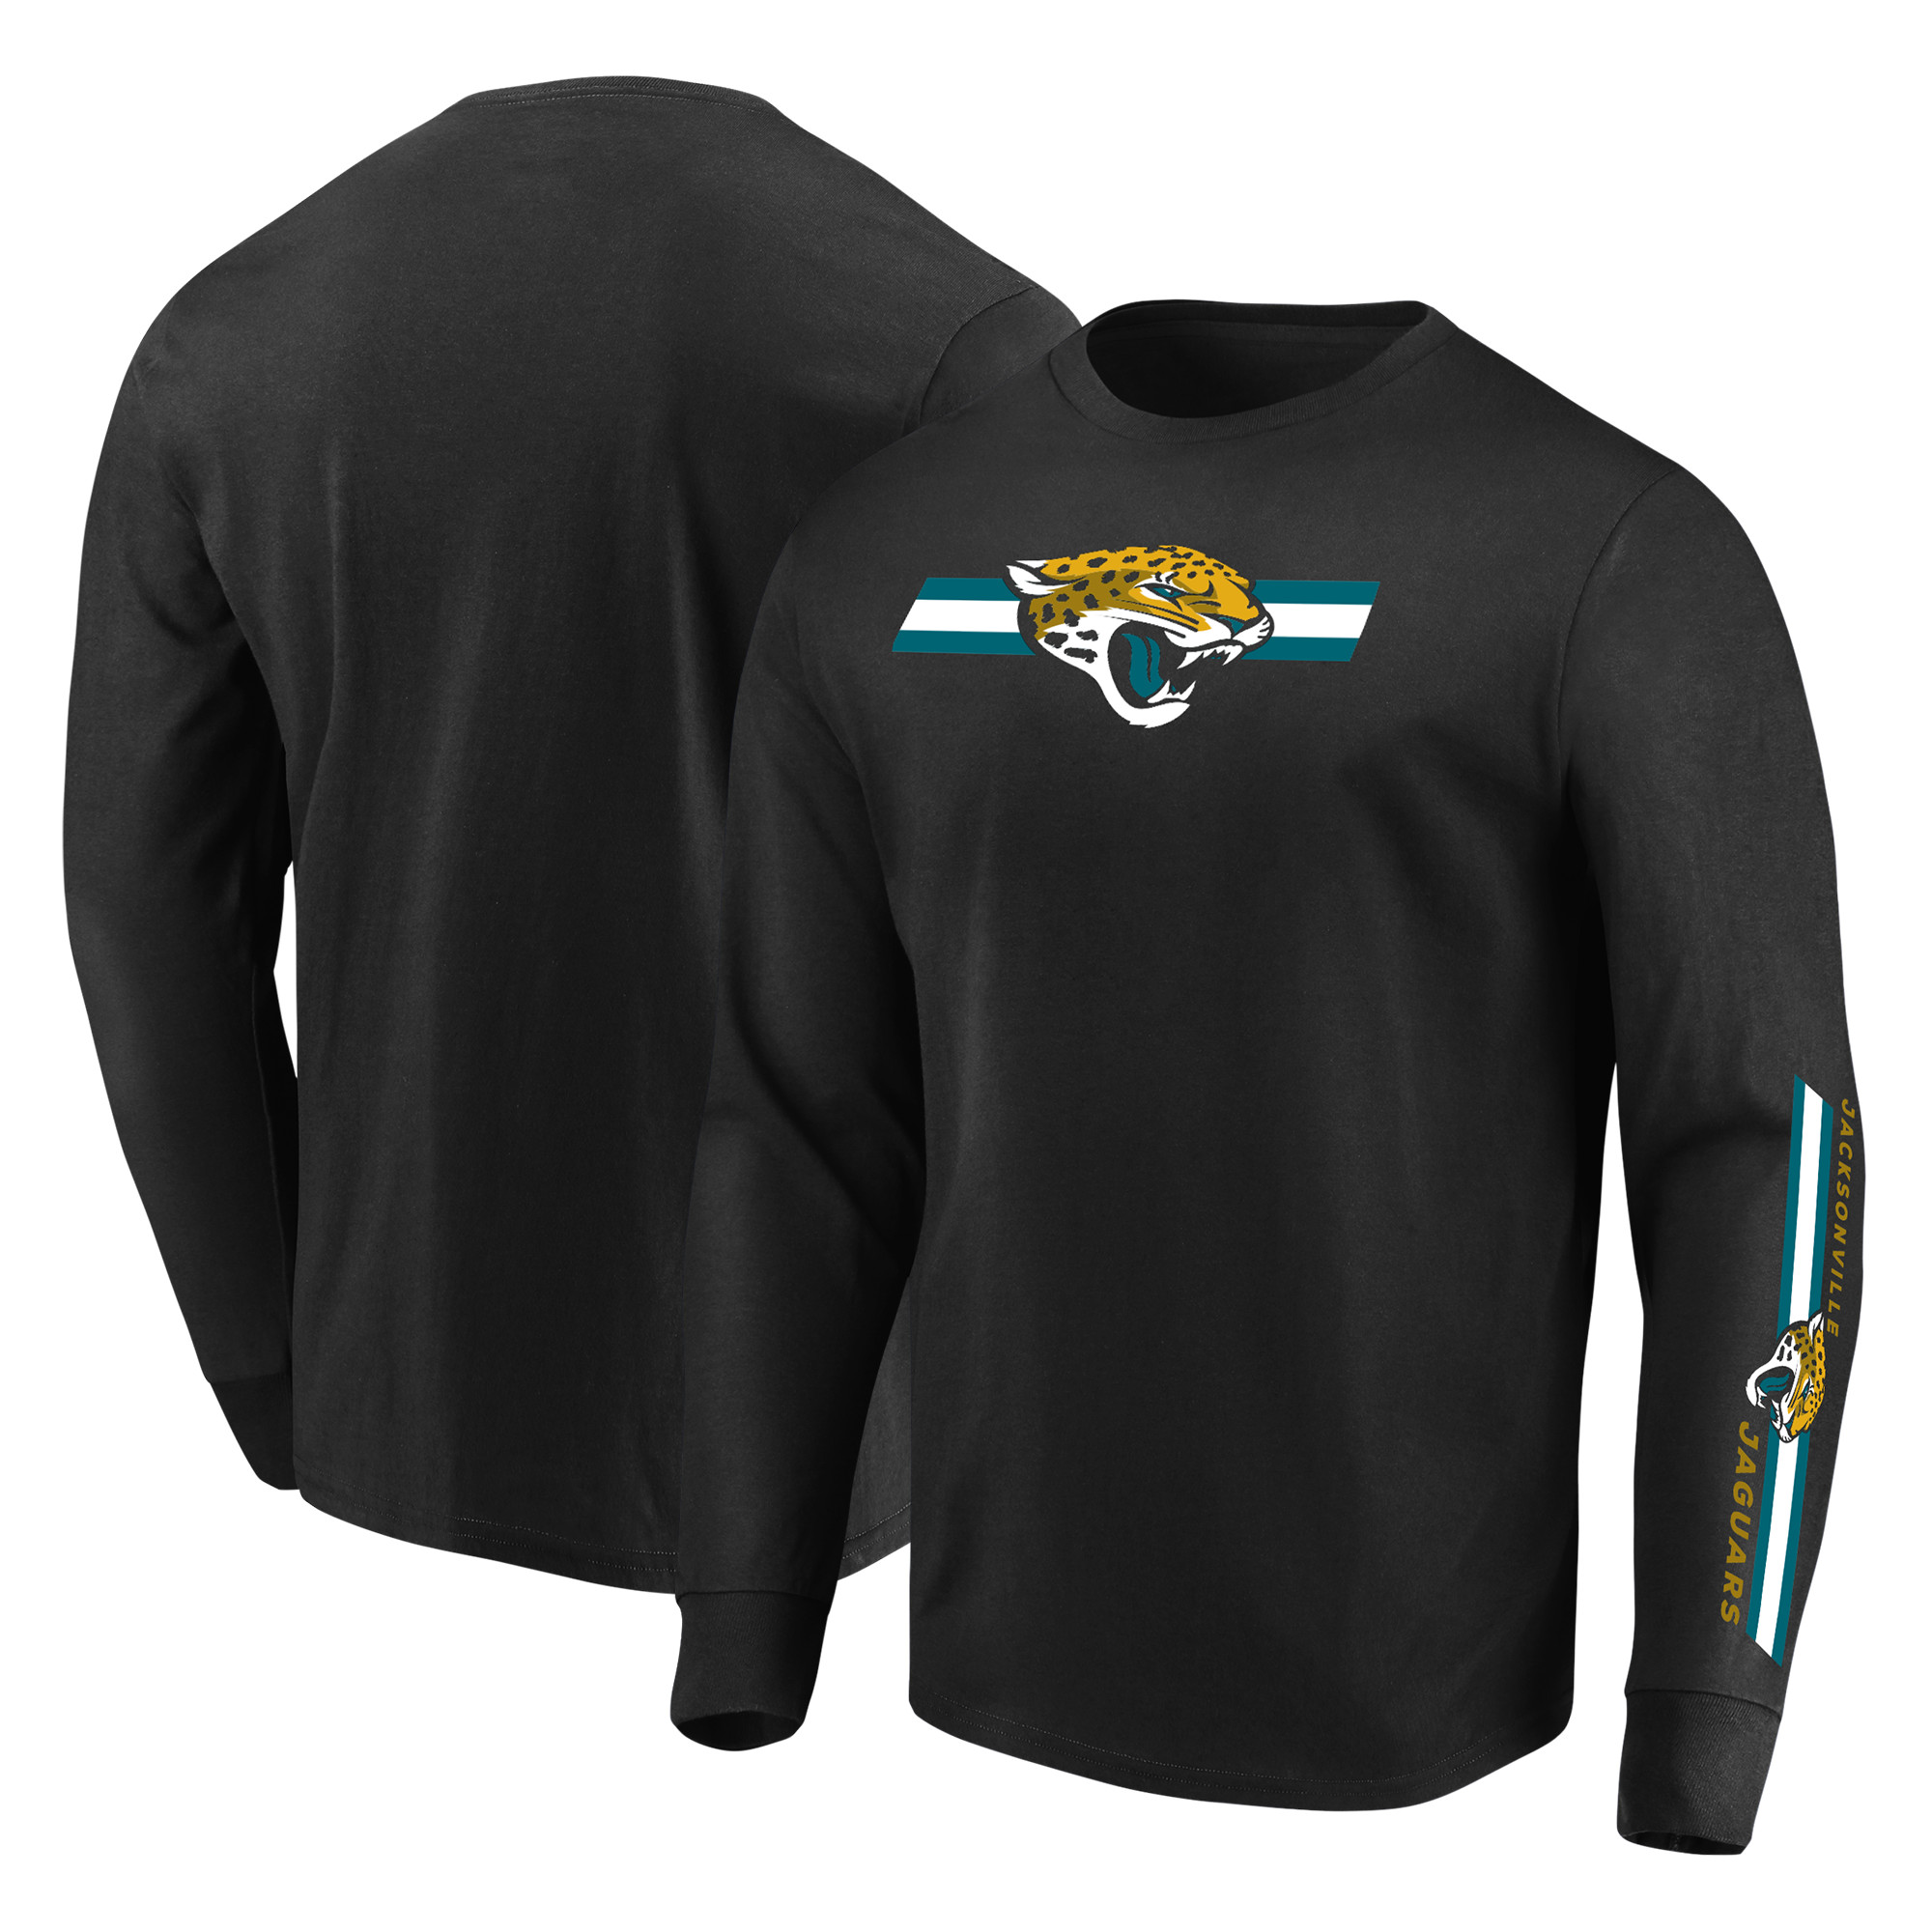 Jacksonville Jaguars Majestic Dual Threat Long Sleeve T-Shirt - Black